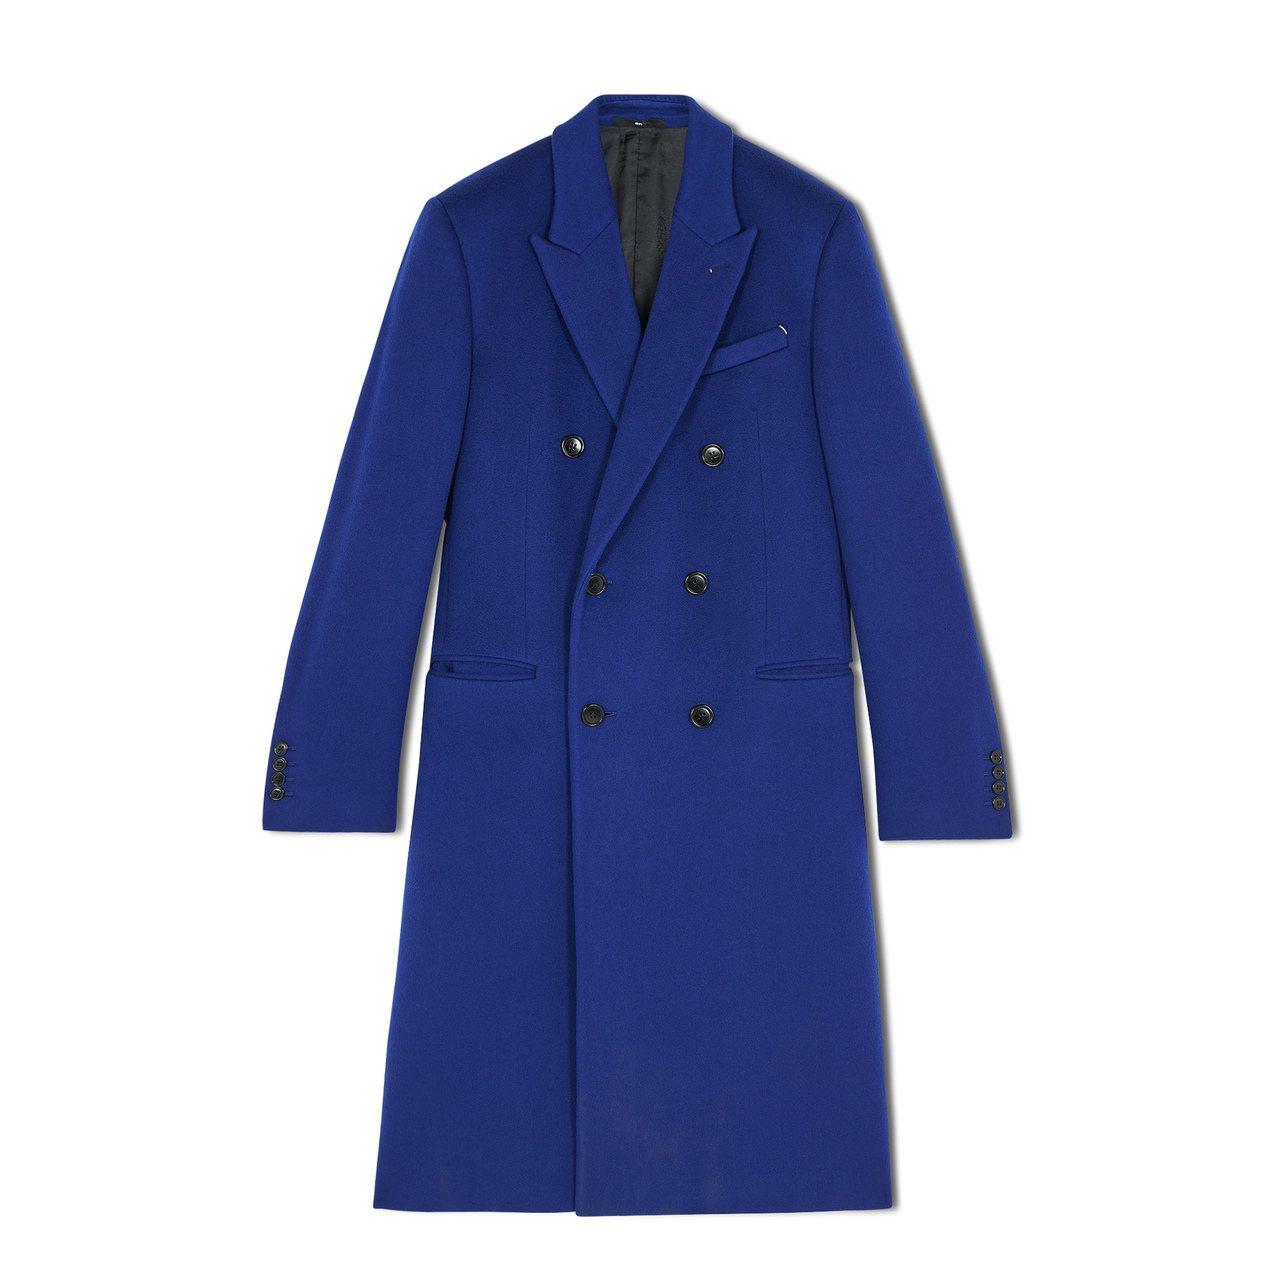 Berluti喀什米爾羊毛藍色大衣22萬4,000元。圖/Berluti提供